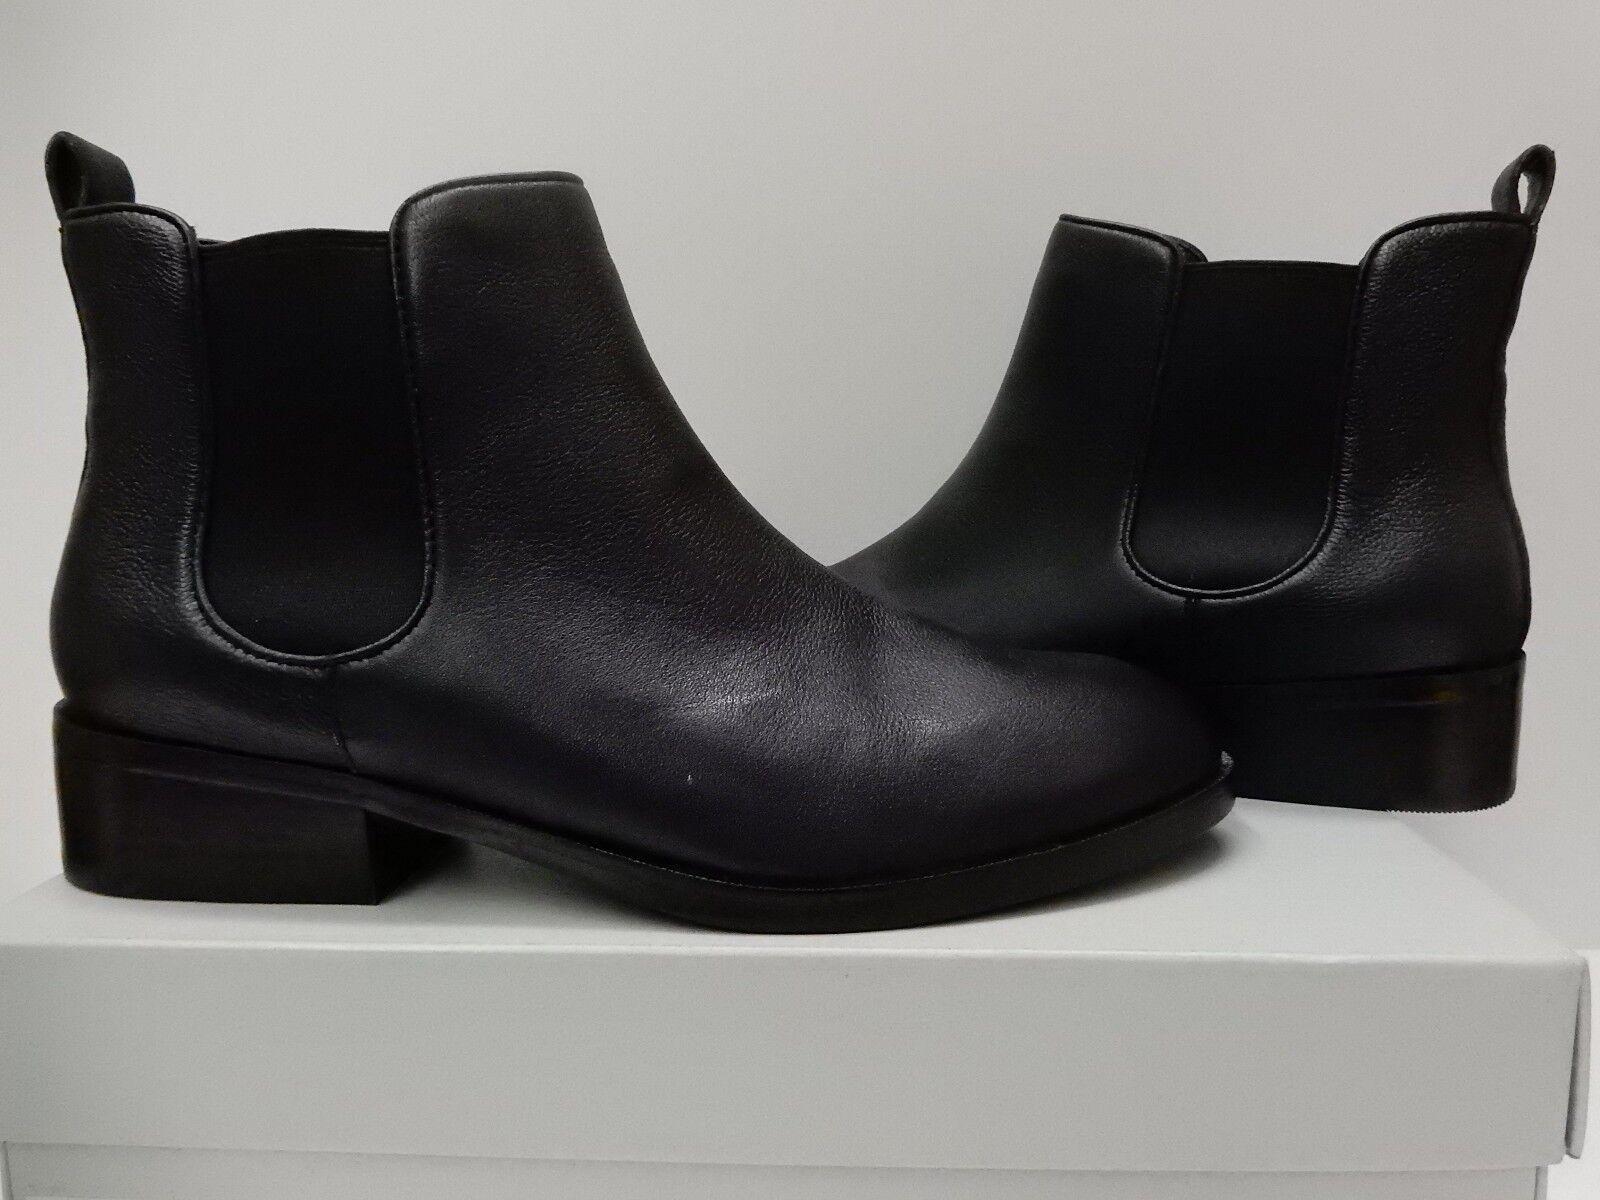 New Cole Haan Landsman Bootie Women's Black Leather Boots Shoes Sizes 7 - 10